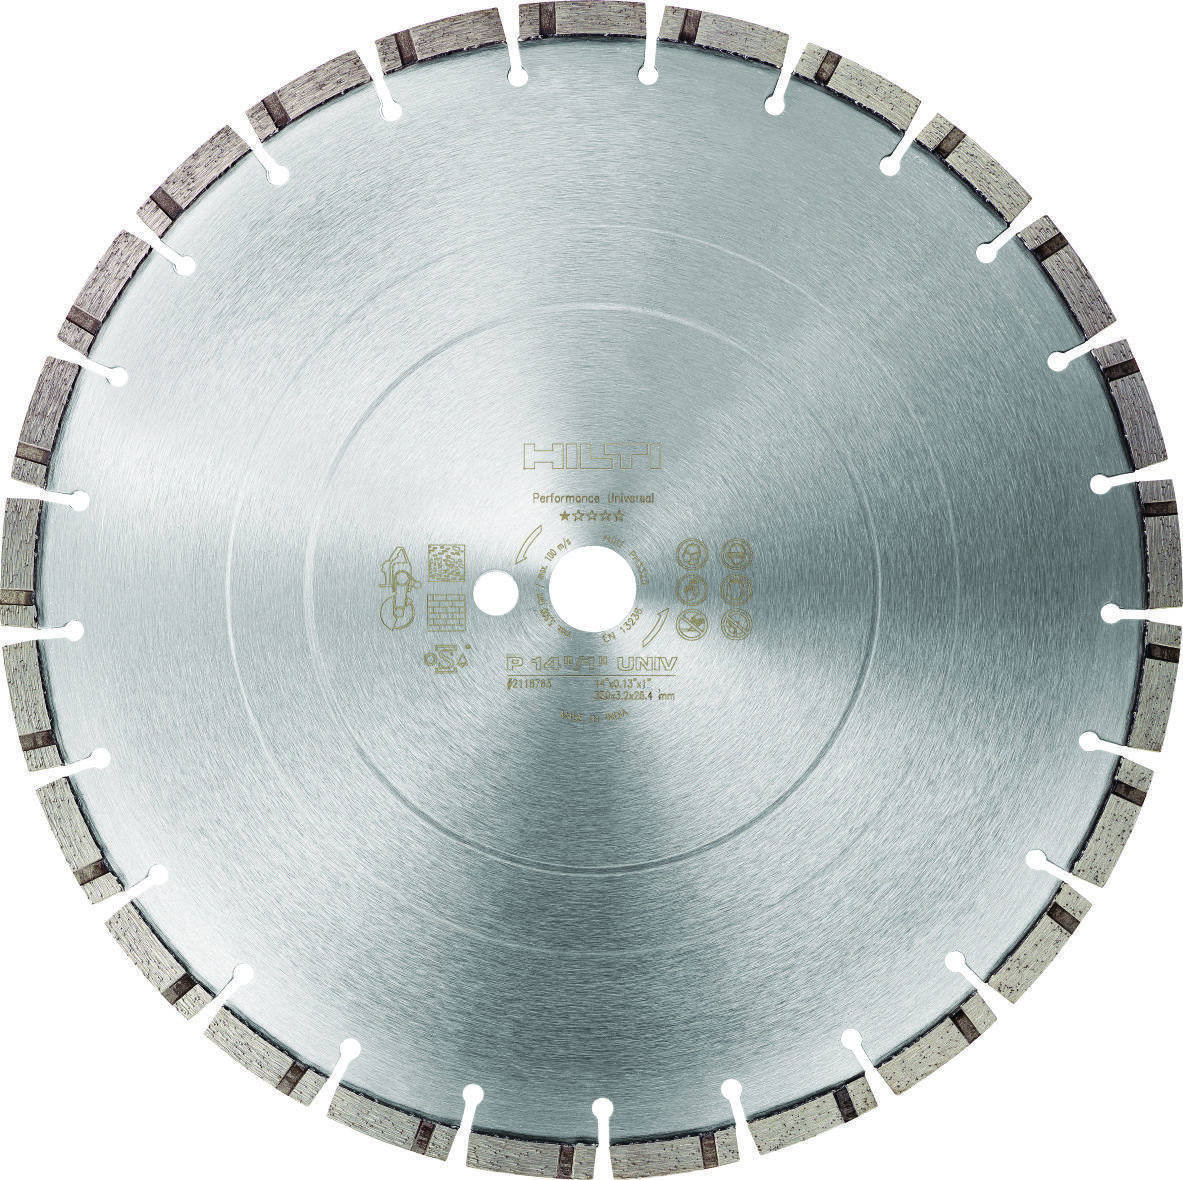 Hilti - Standard Diamond Blade 00002